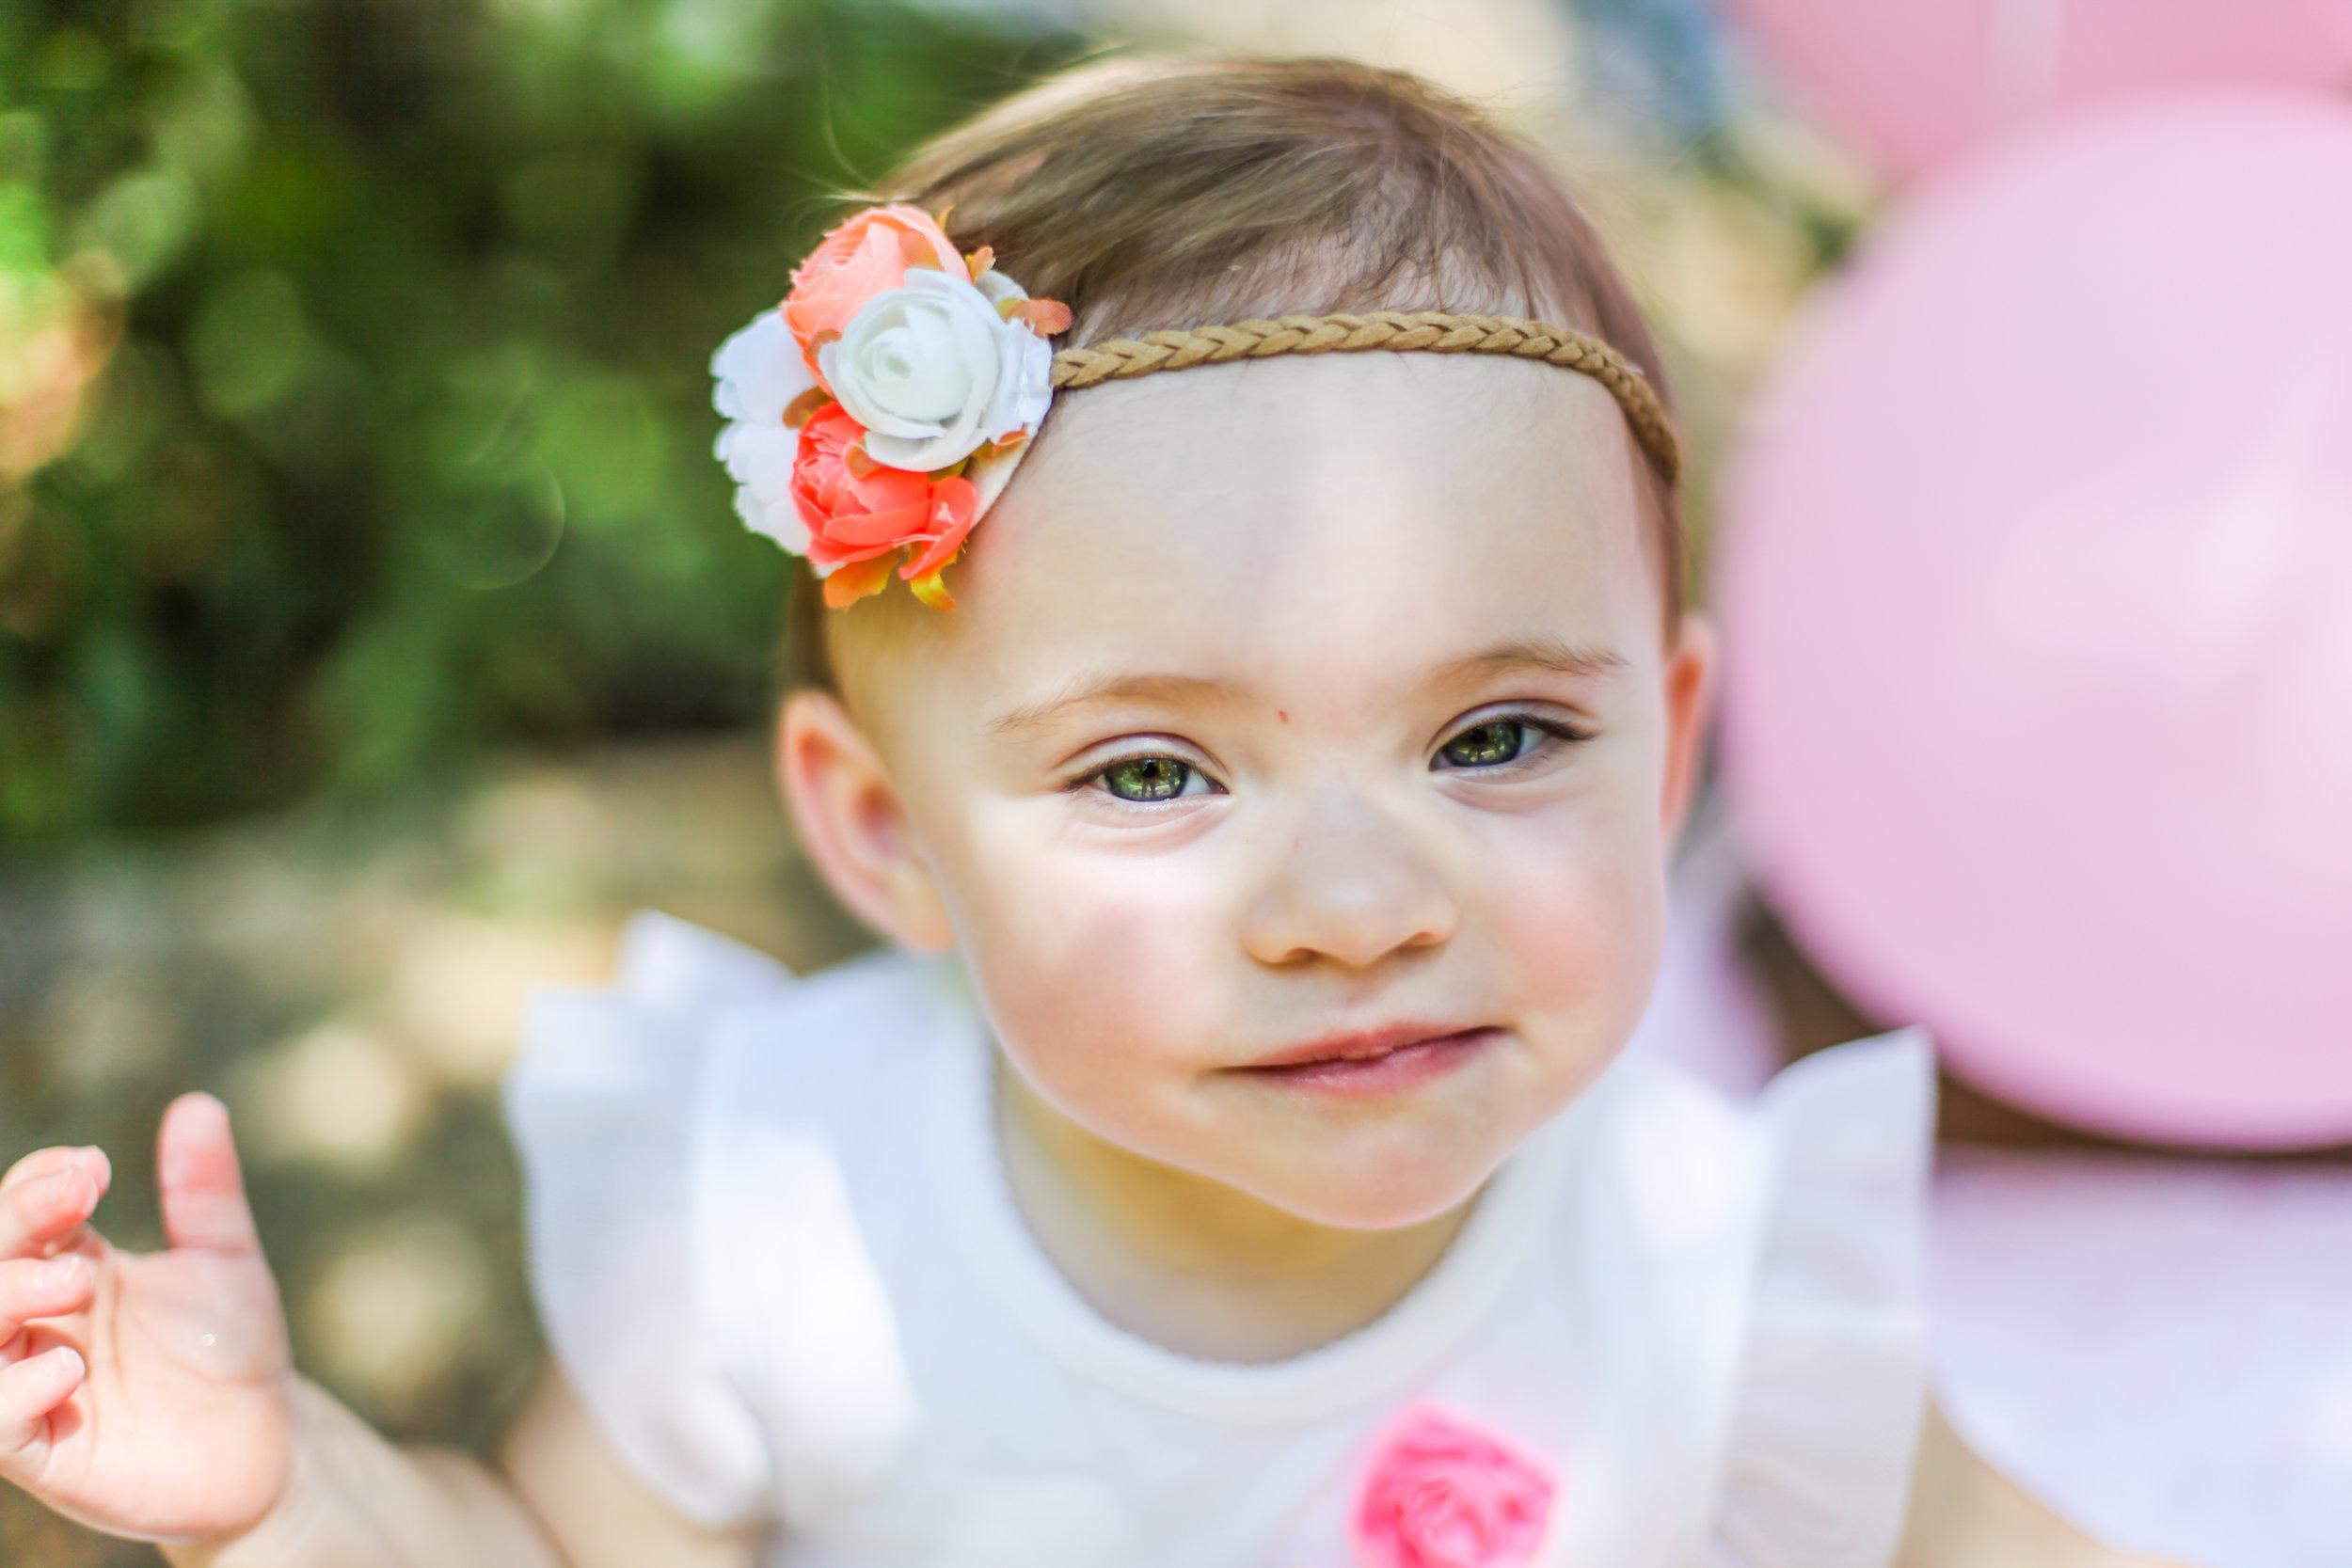 woodstock baby photography angela elliott-87.jpg